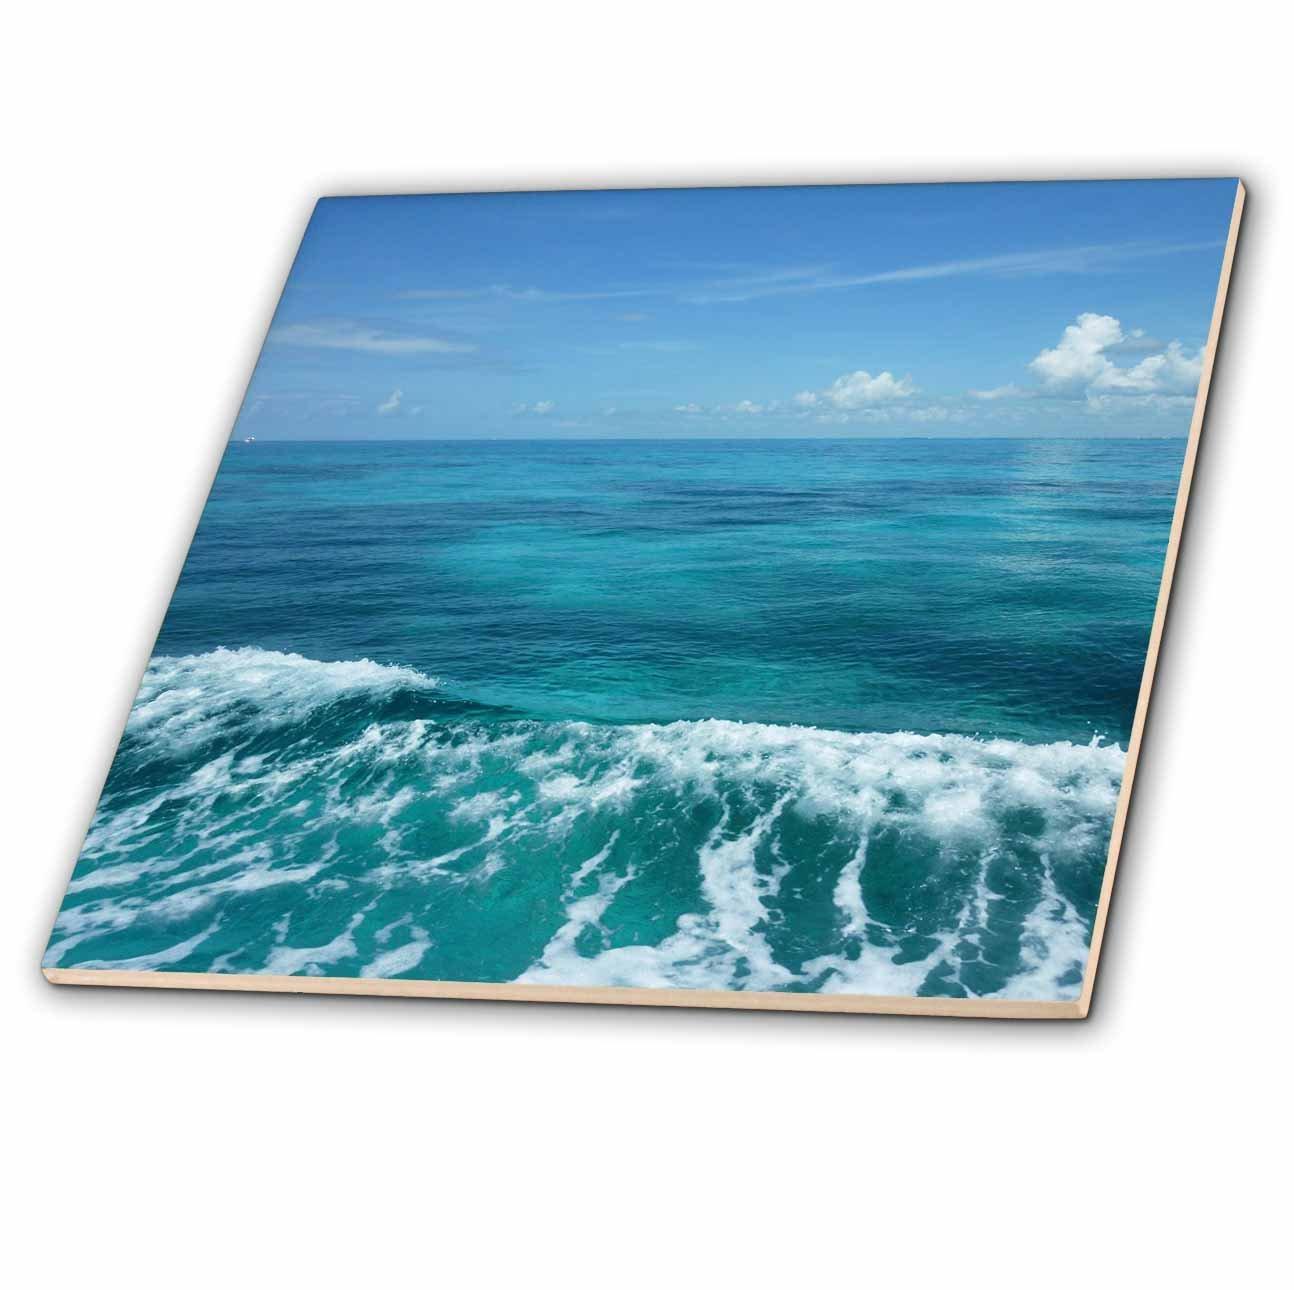 4-Inch 3dRose ct/_41637/_1 Florida Key Waves Iii-Ceramic Tile